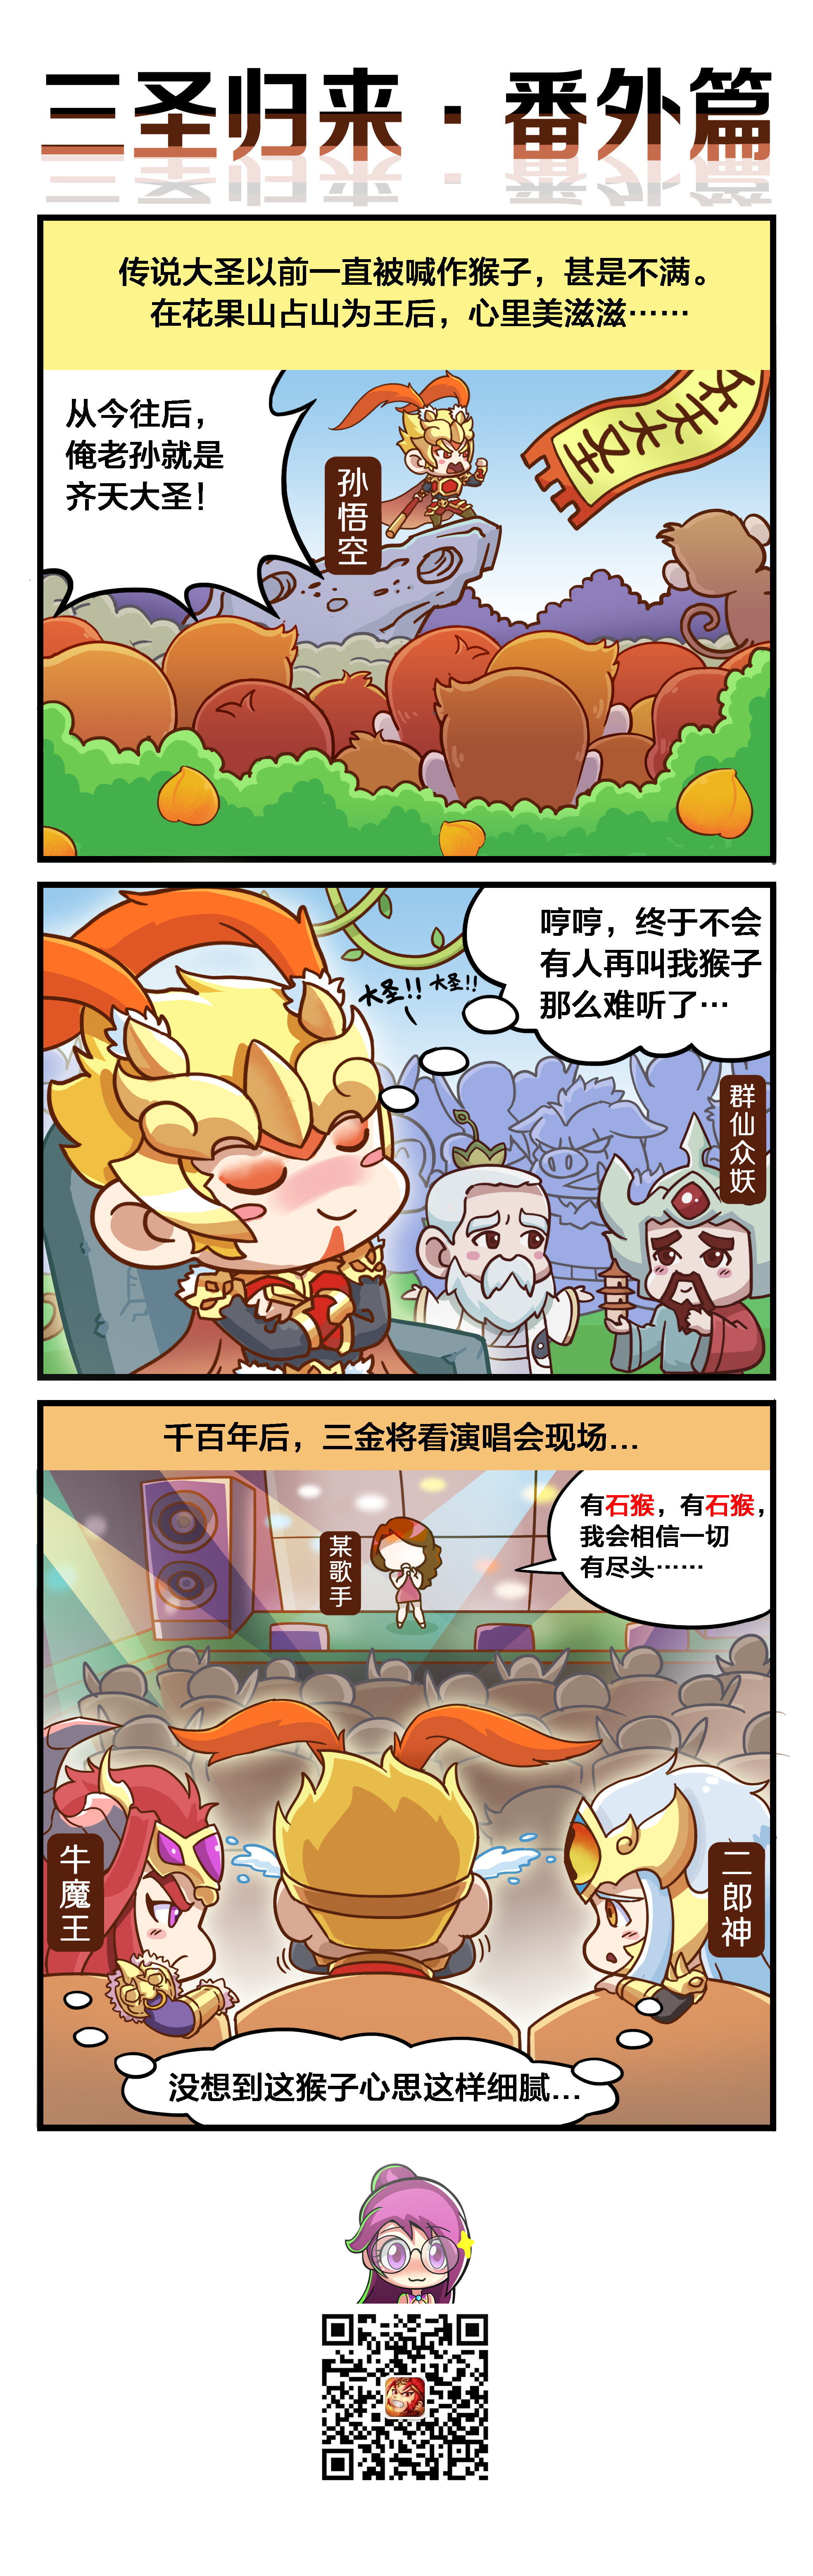 qq西游宿命轮回成就_《少年西游记》官方网站——以少年之名 重塑西游